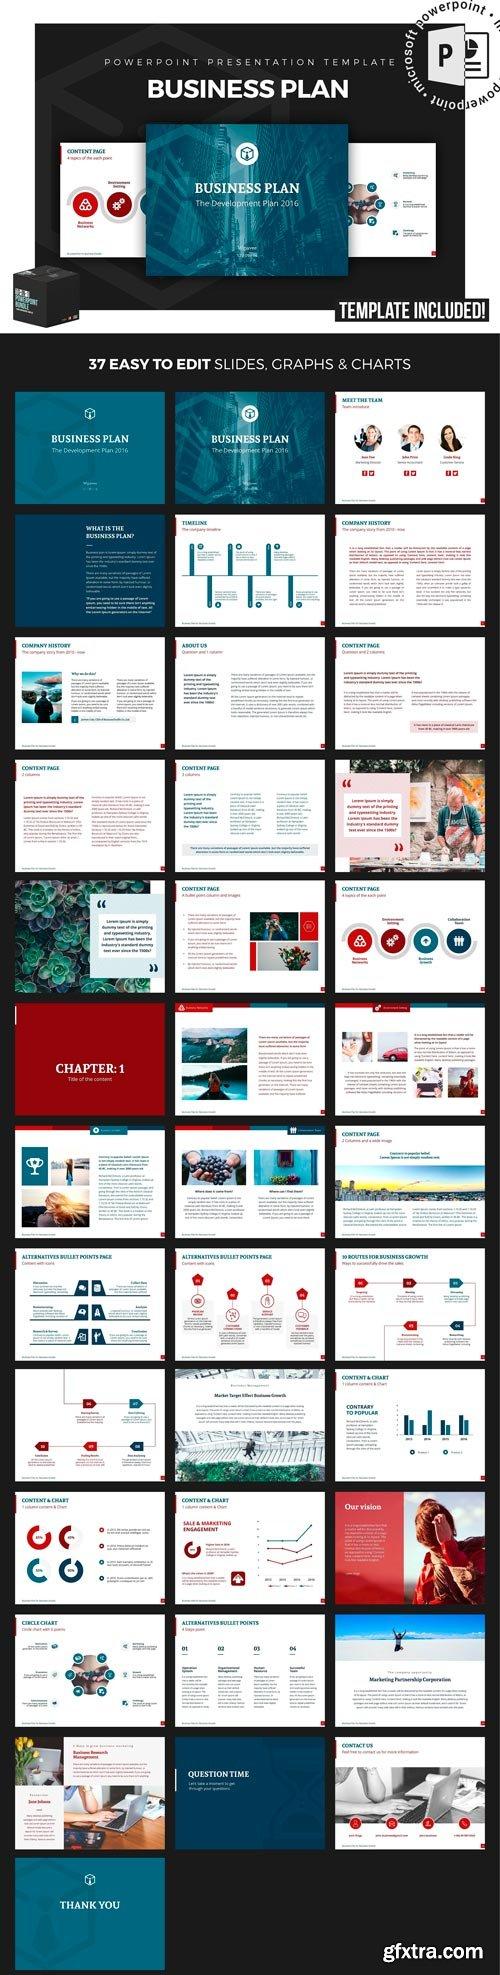 CM - 10-IN-1 PowerPoint Bundle 1620962